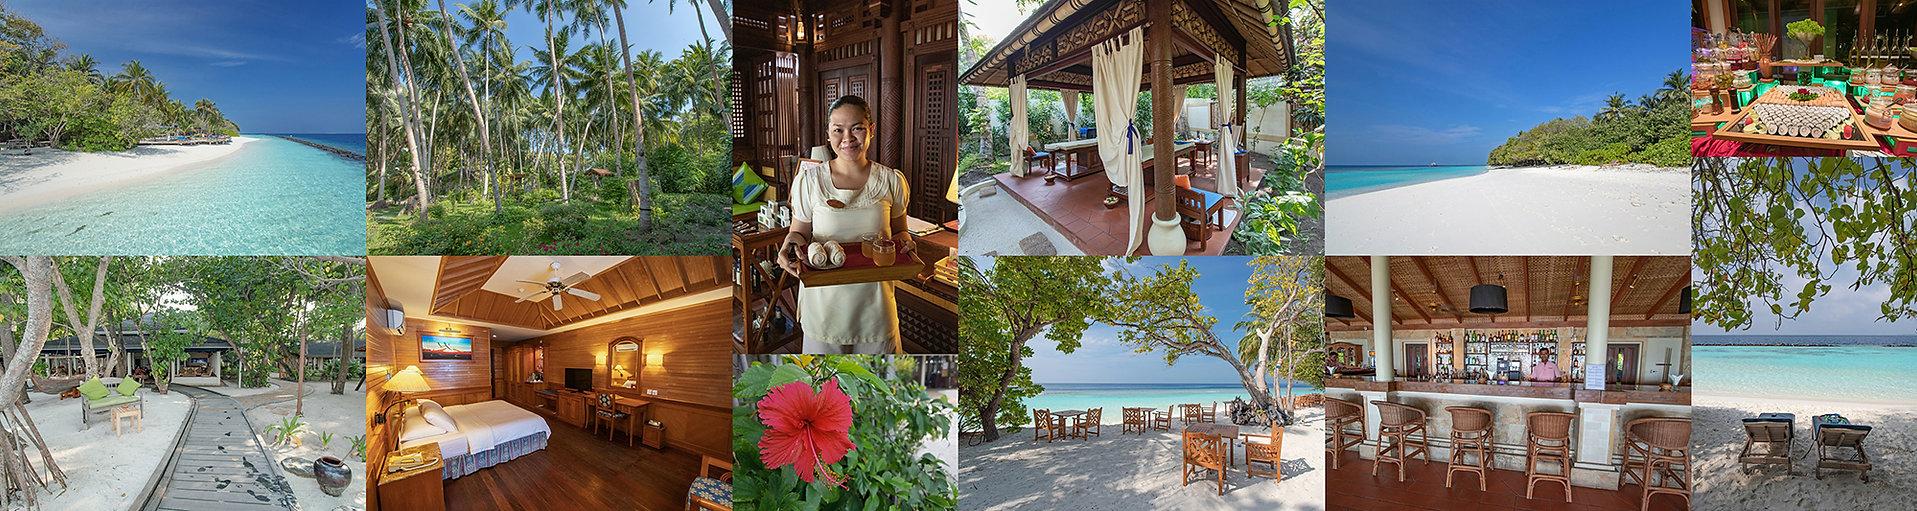 Royal Island Resort & Spa, Baa atol, Maledivy